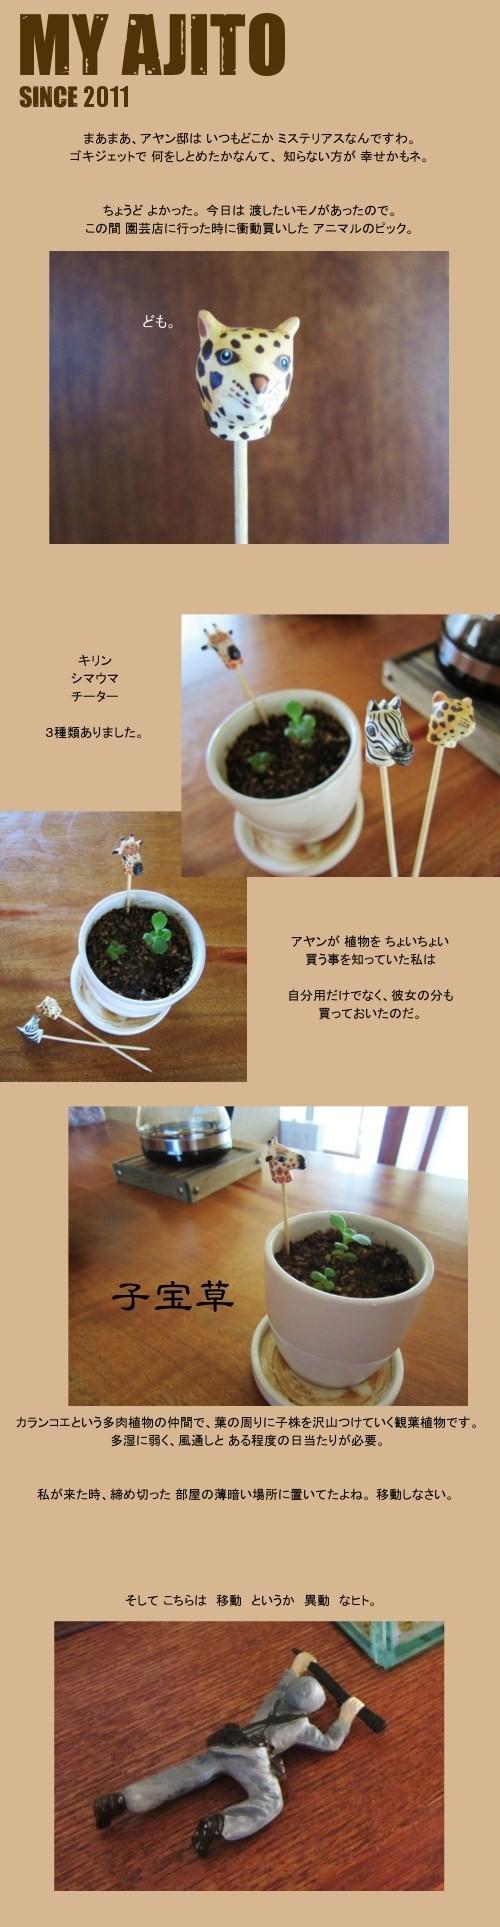 tsuke_05.jpg